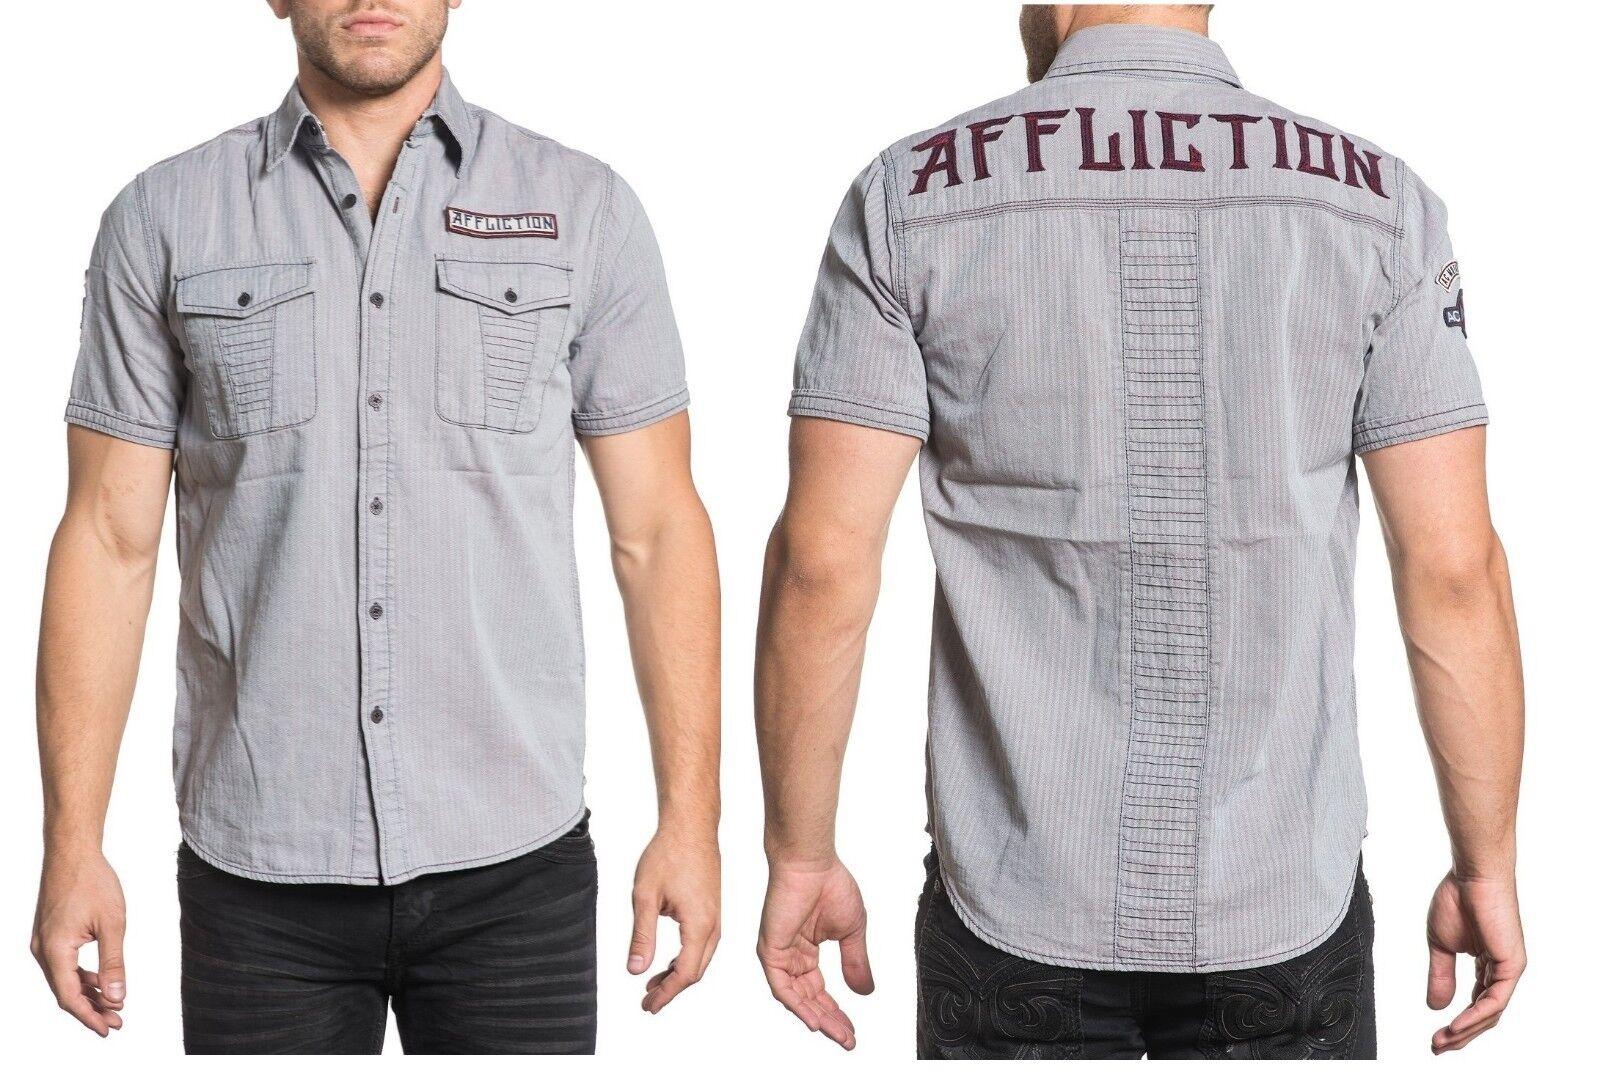 NEW AFFLICTION MEN'S TRIBBETT LOGO VINTAGE WOVEN CASUAL DRESS SHIRT TOP